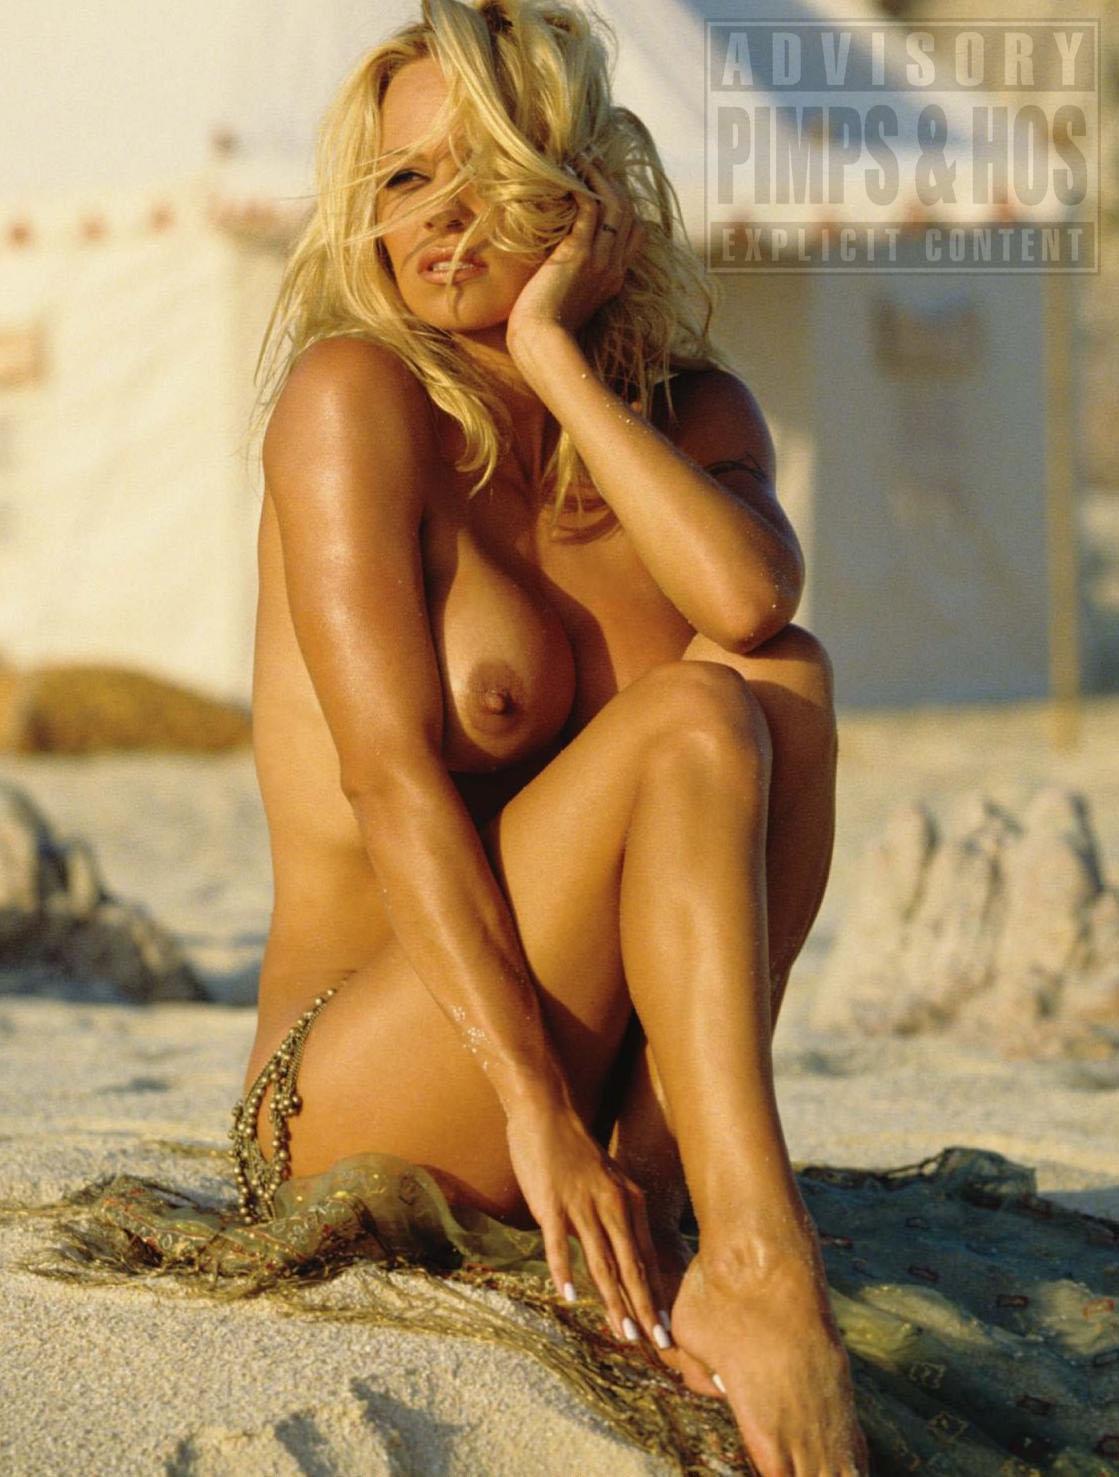 Something Pamela anderson on nude beach